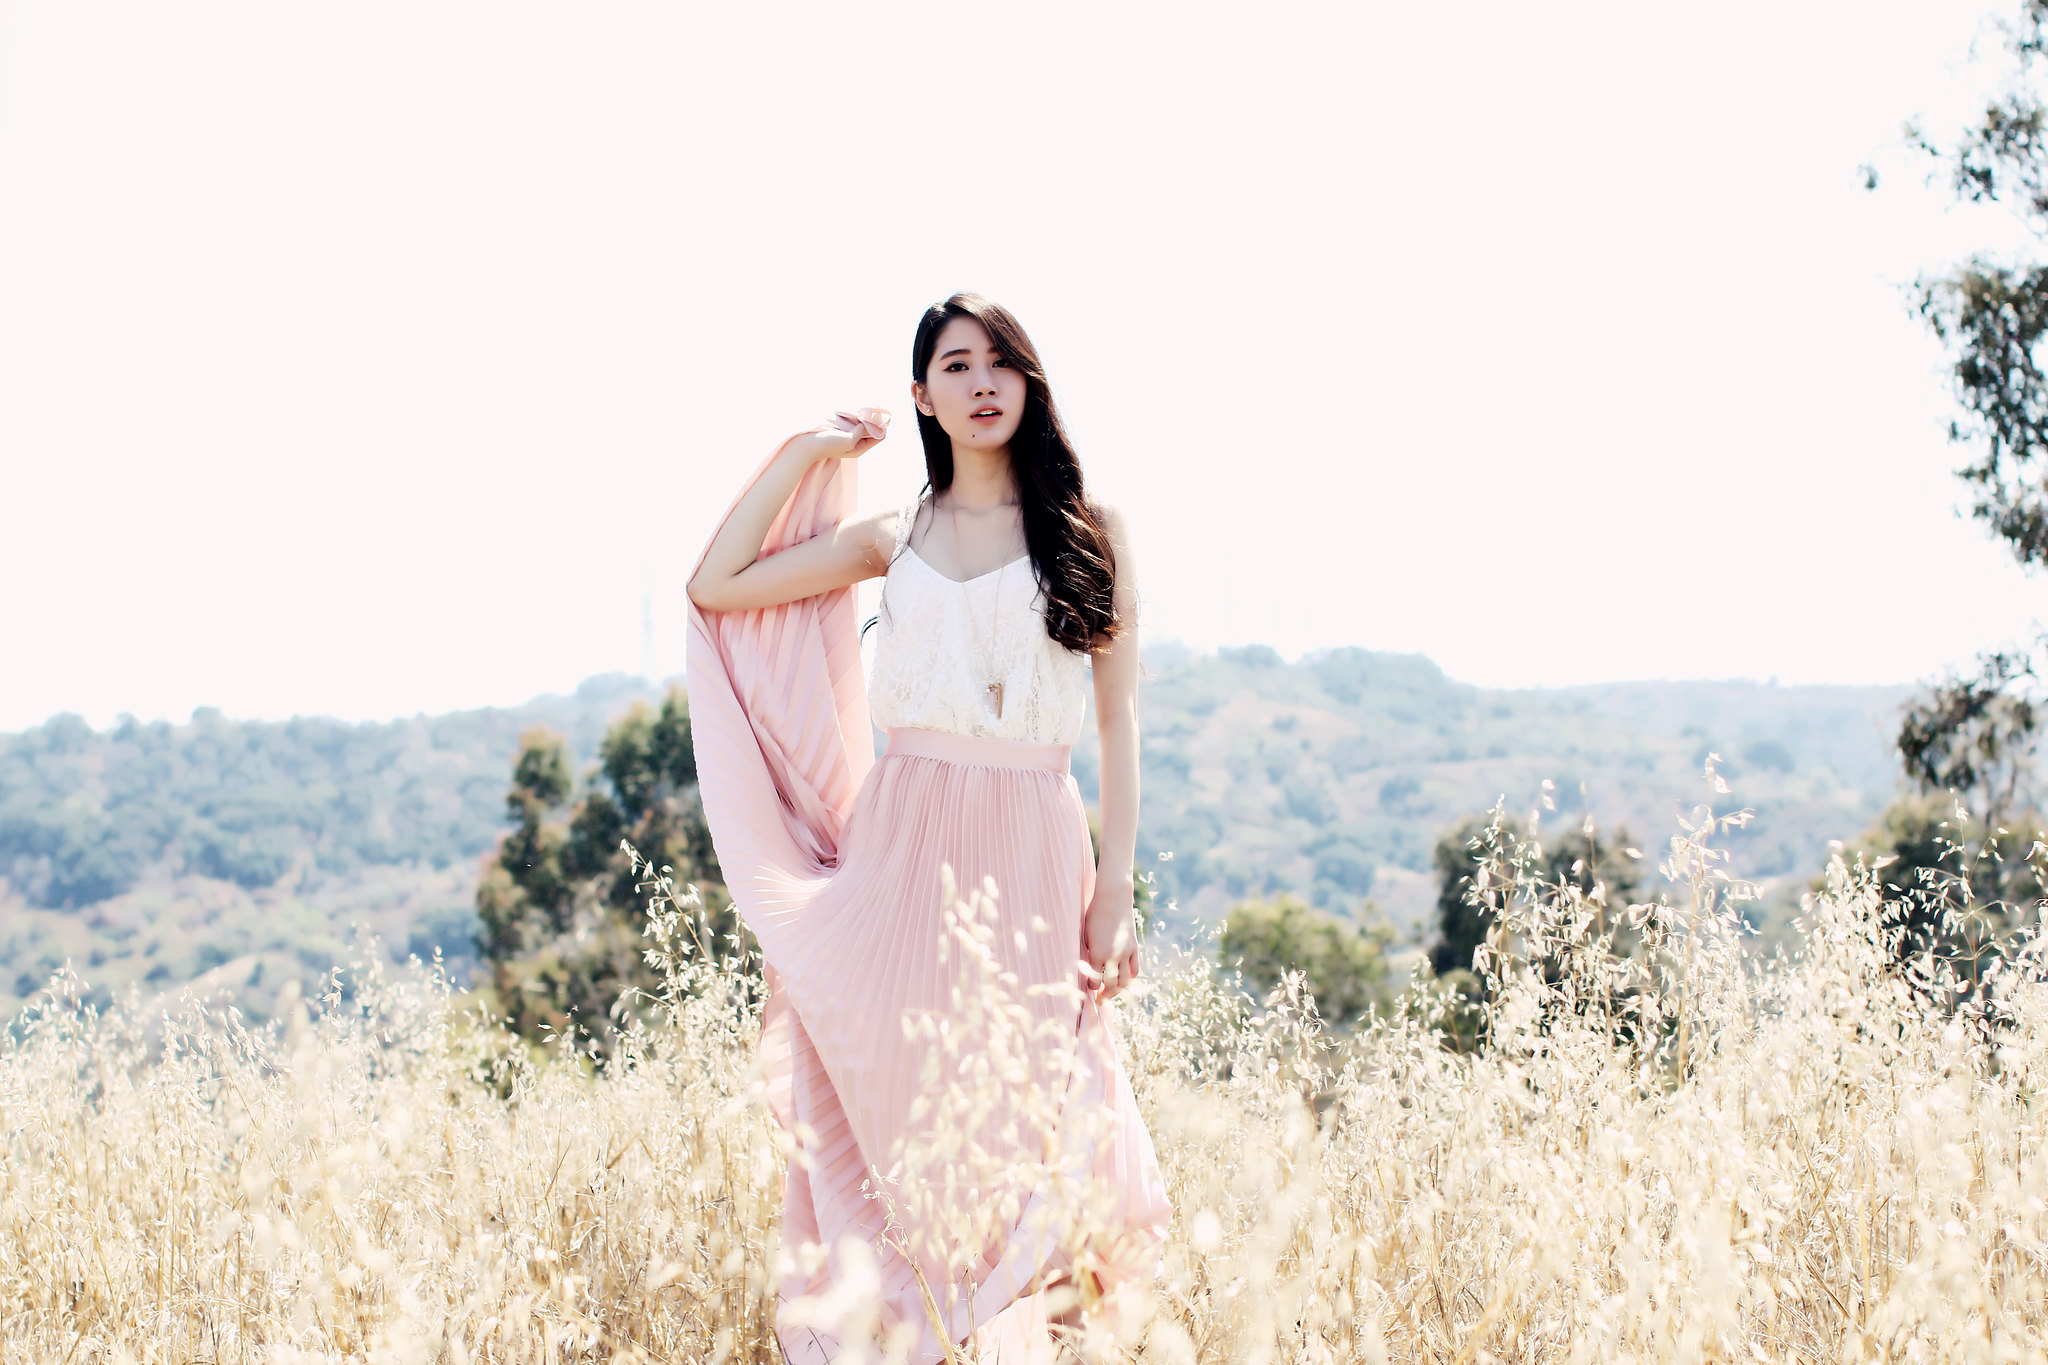 9725-pink-maxi-dress-lace-summer2016